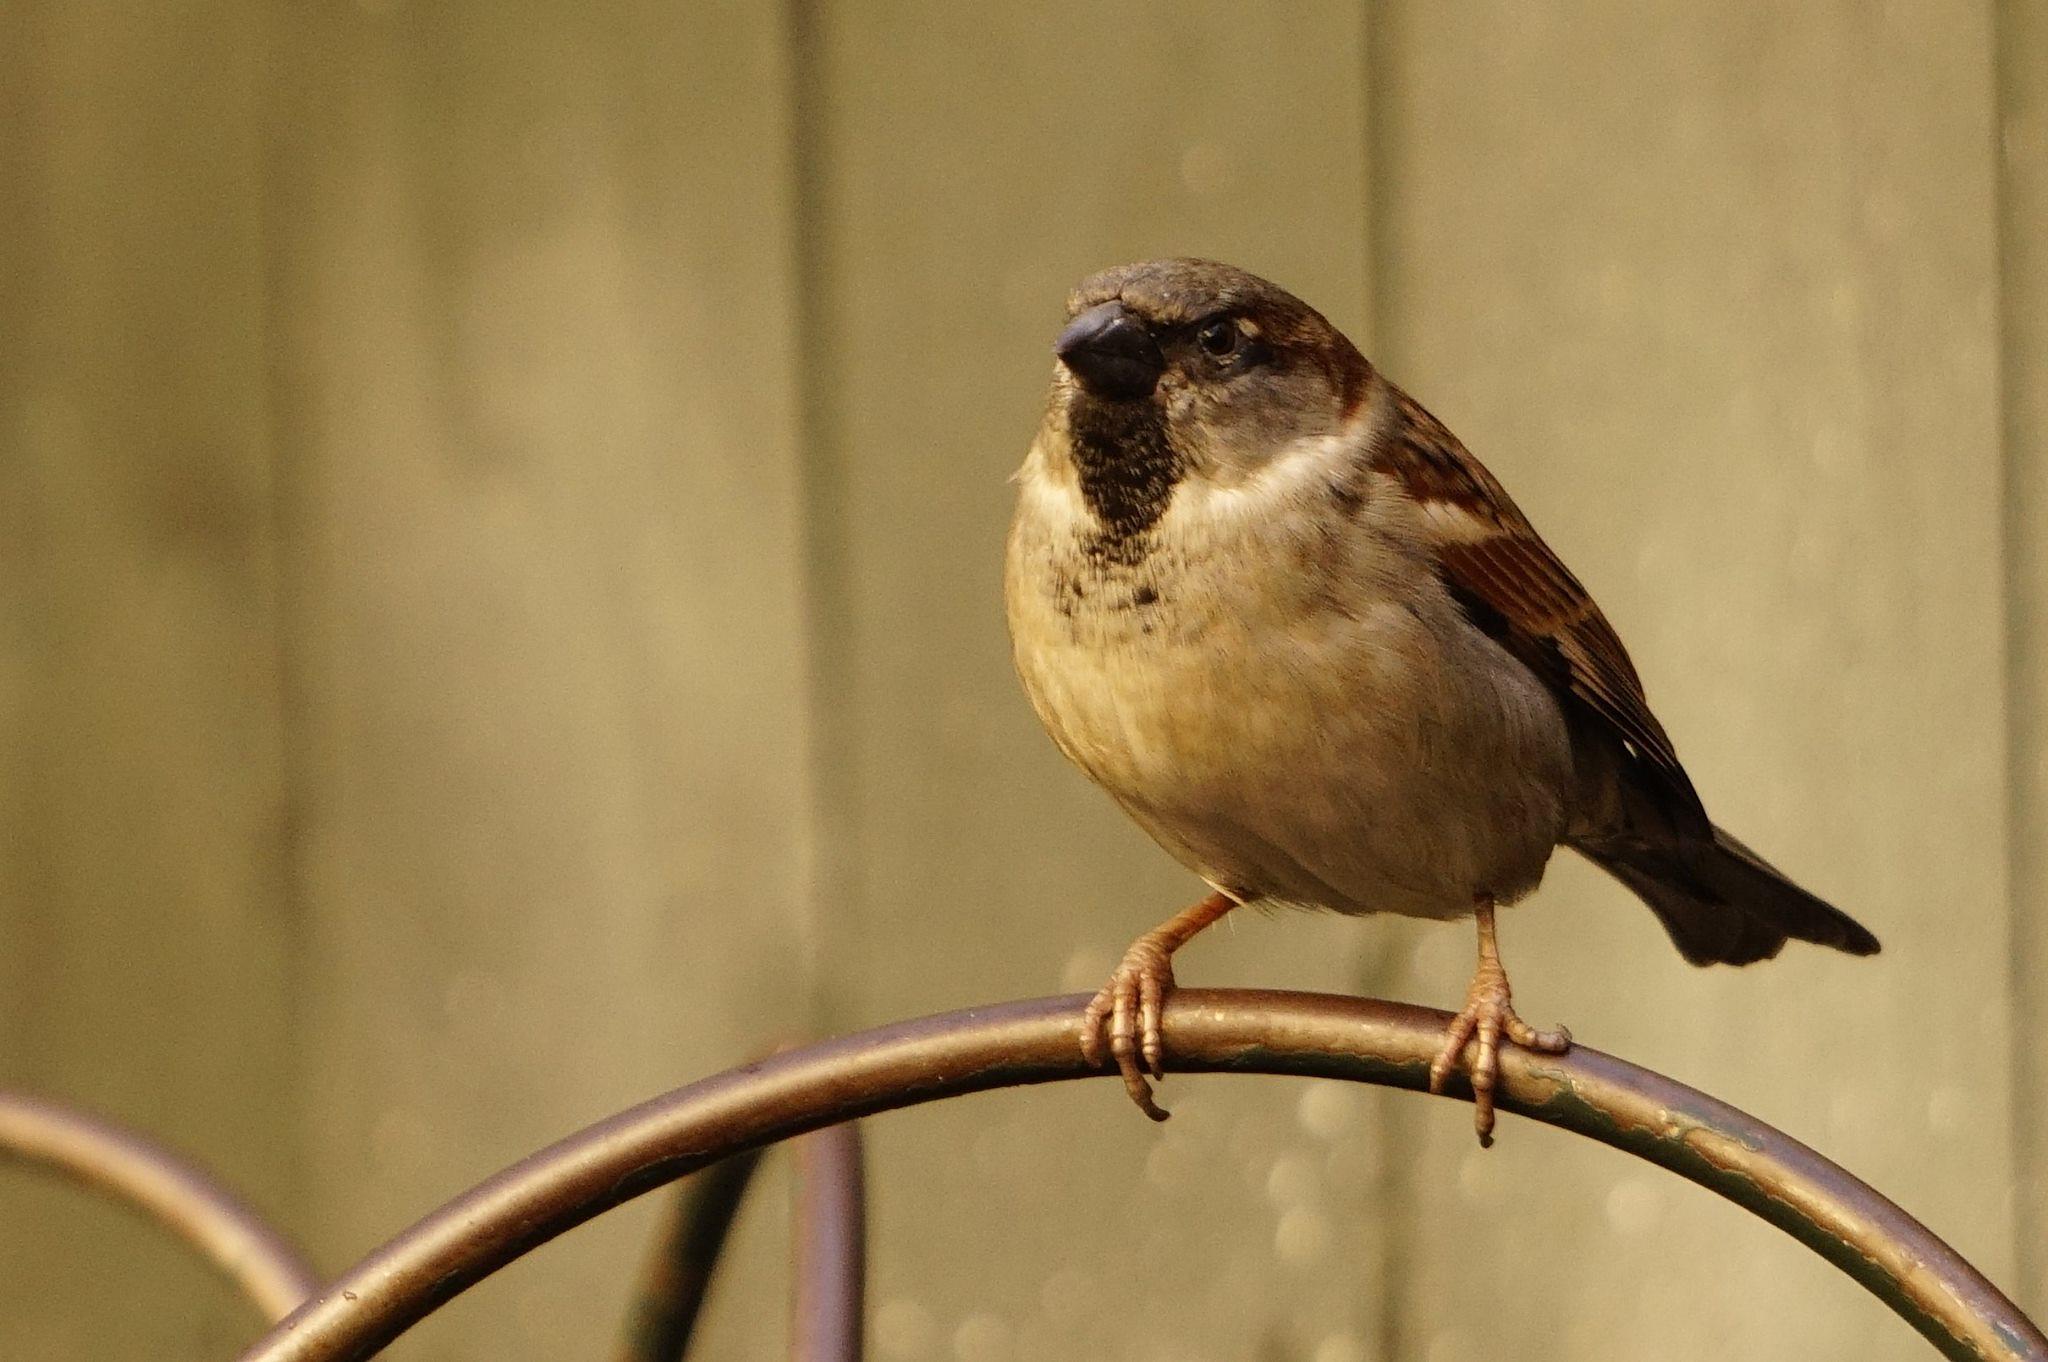 Sparrow by donBeto